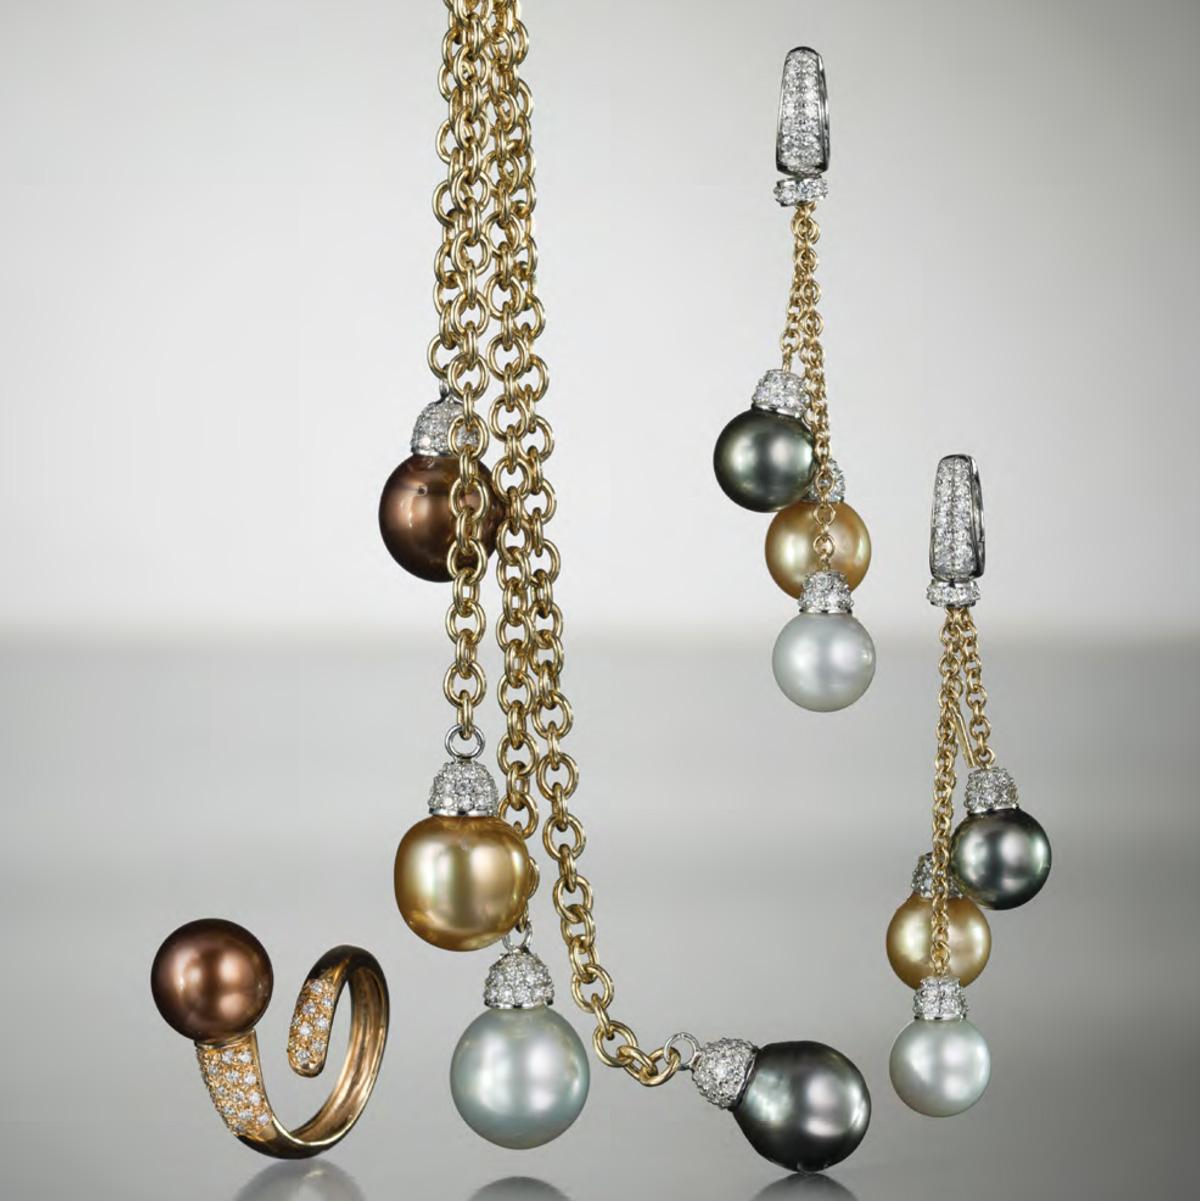 Perle multicolor - Multicolor Pearls